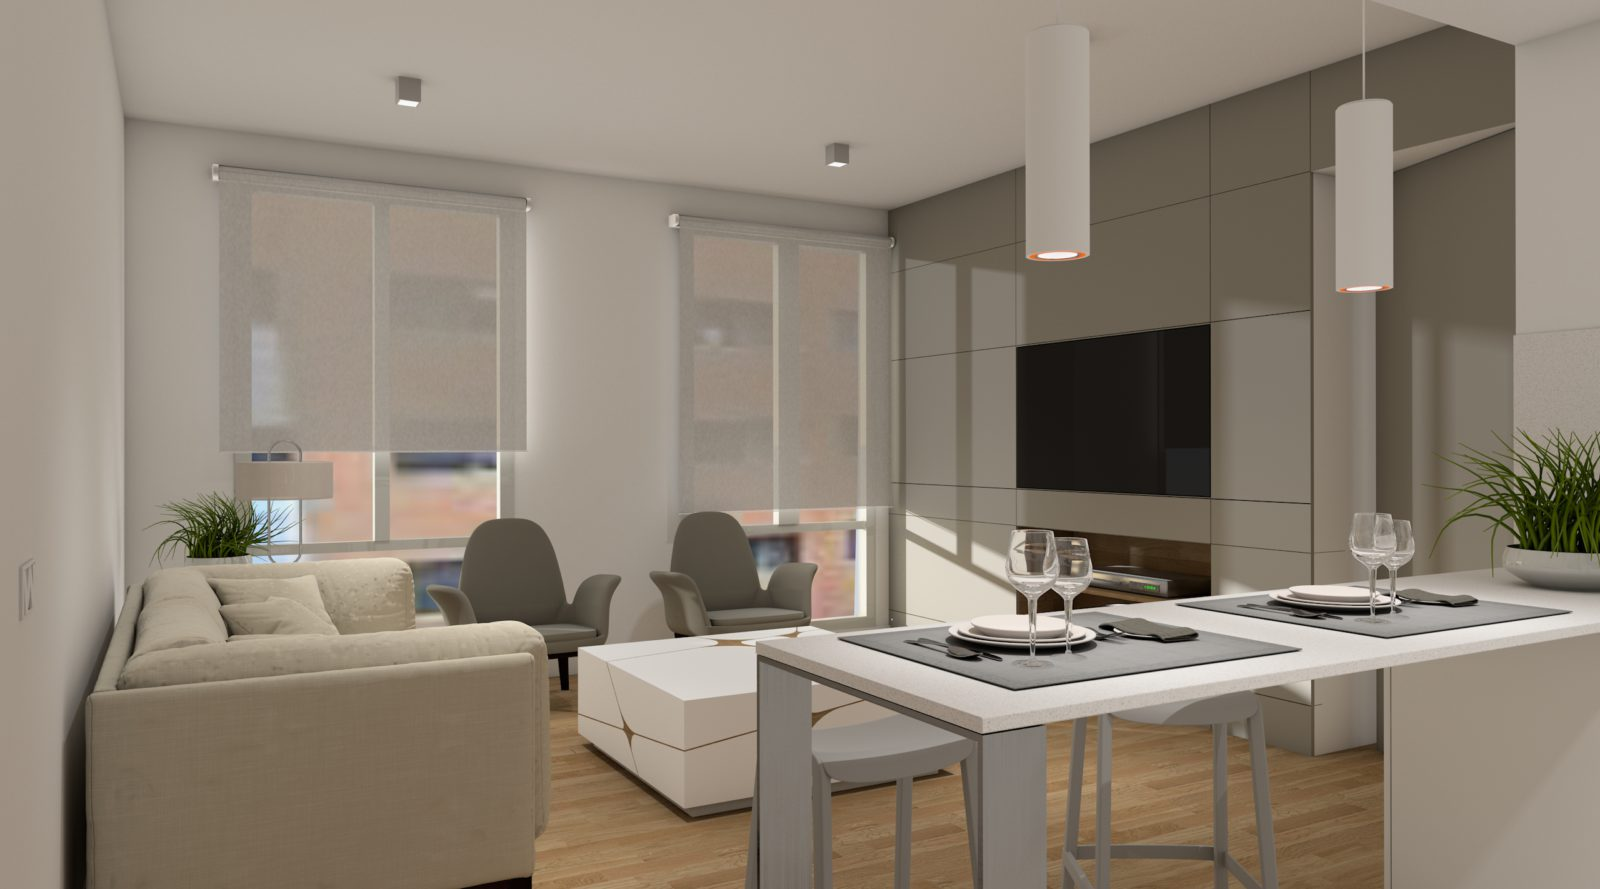 SALON MAIRENA - Apartamento | Mairena del Aljarafe | Sevilla